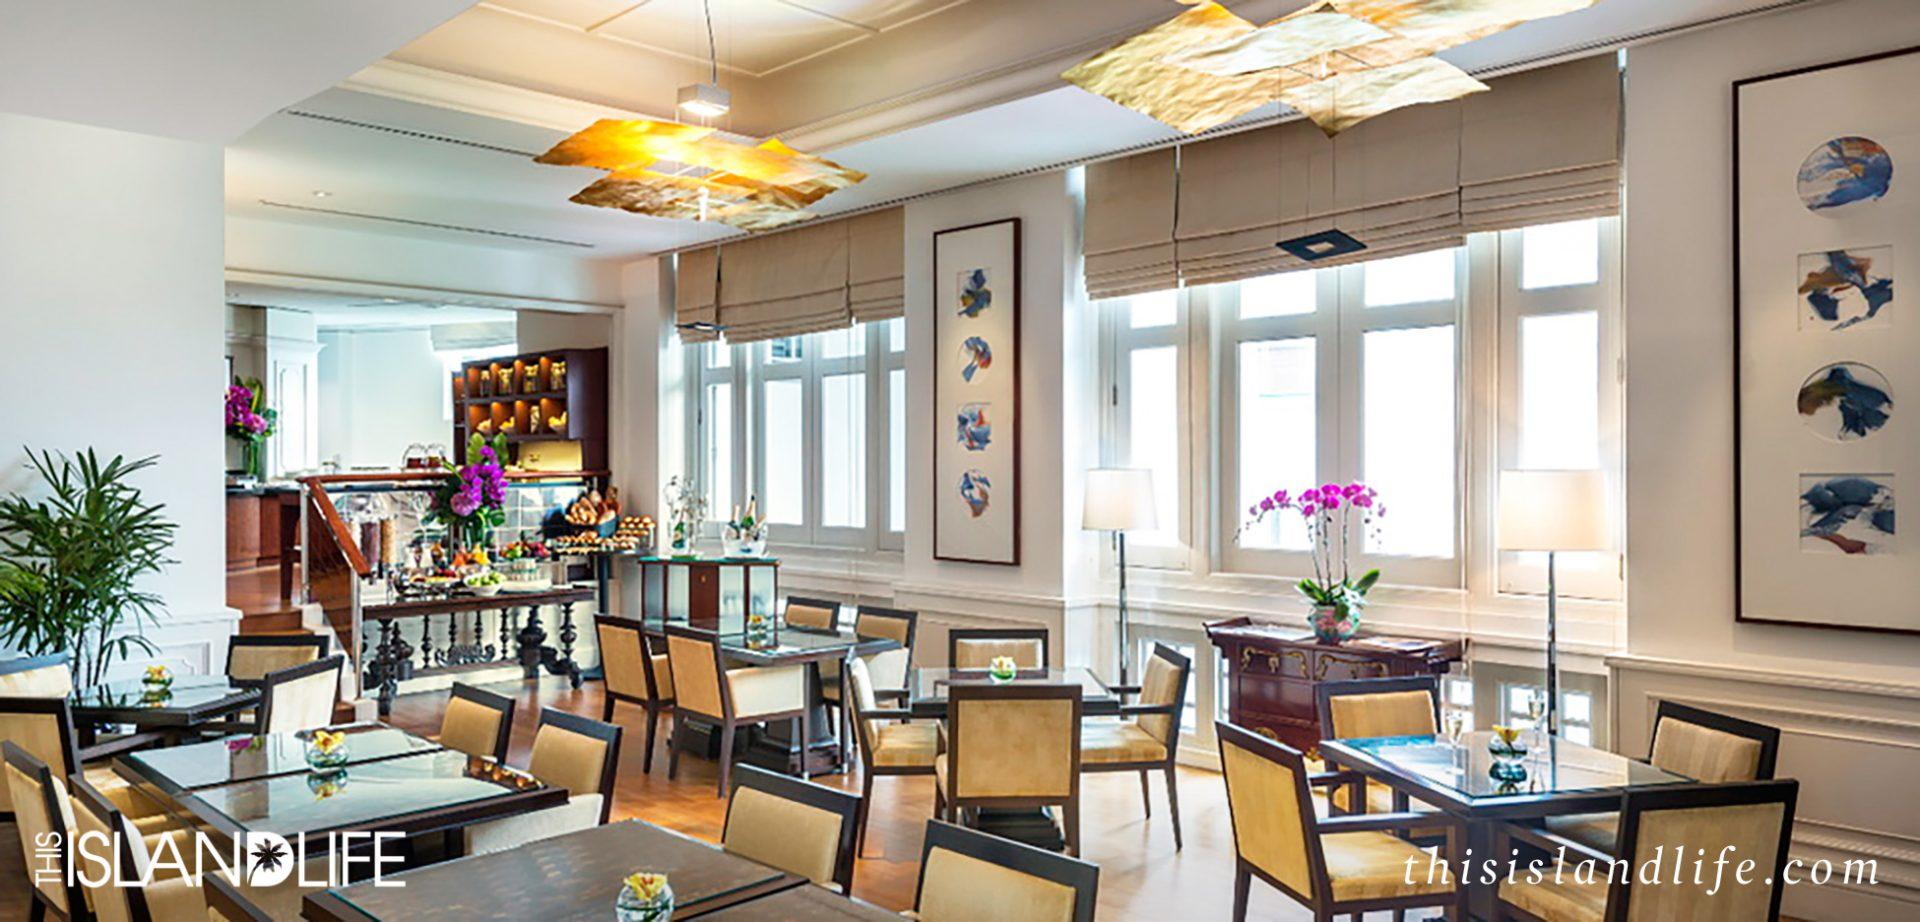 THIS ISLAND LIFE | The Fullerton Hotel, Singapore